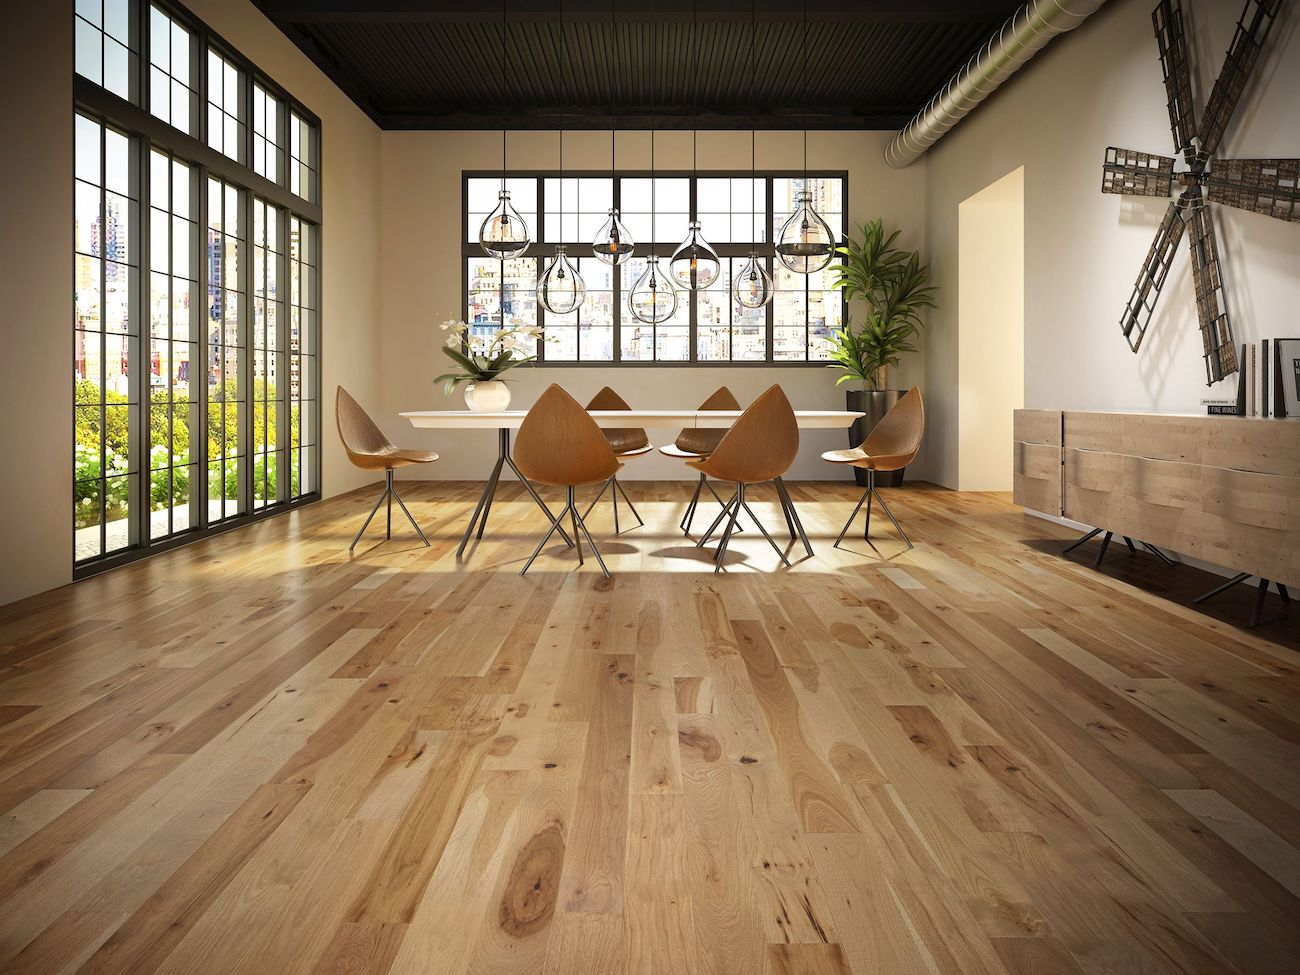 Unfinished Wide Plank Hardwood Flooring